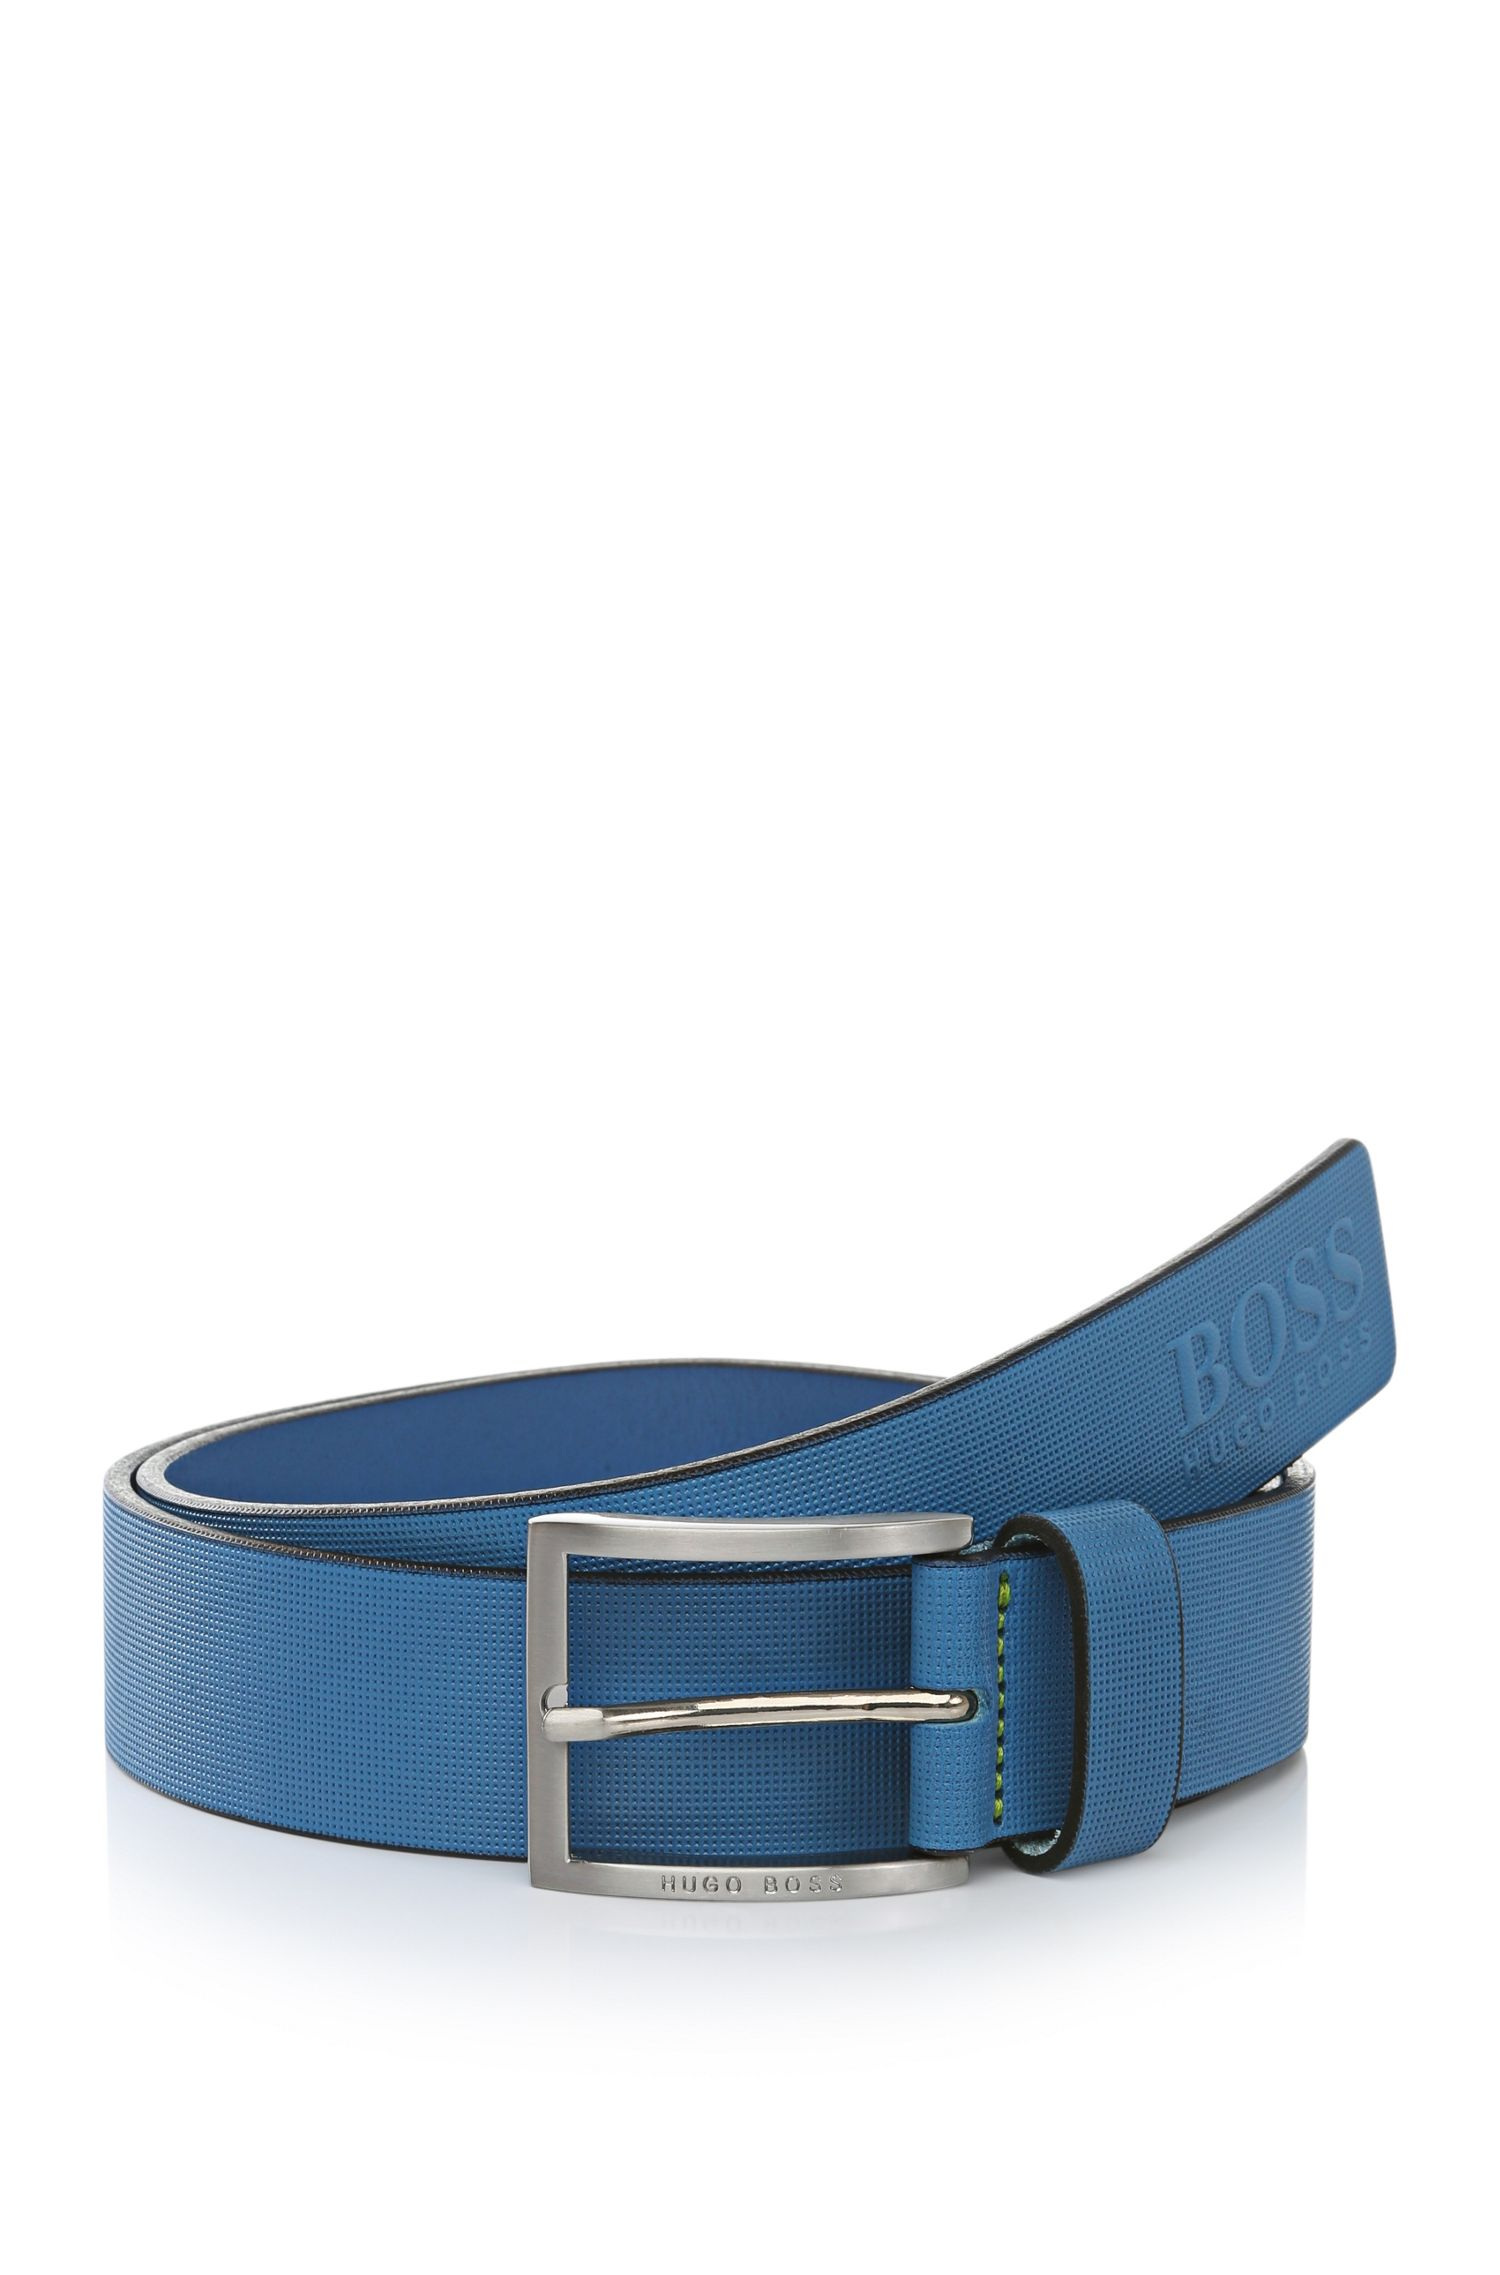 'Tienzo' | Textured Leather Belt